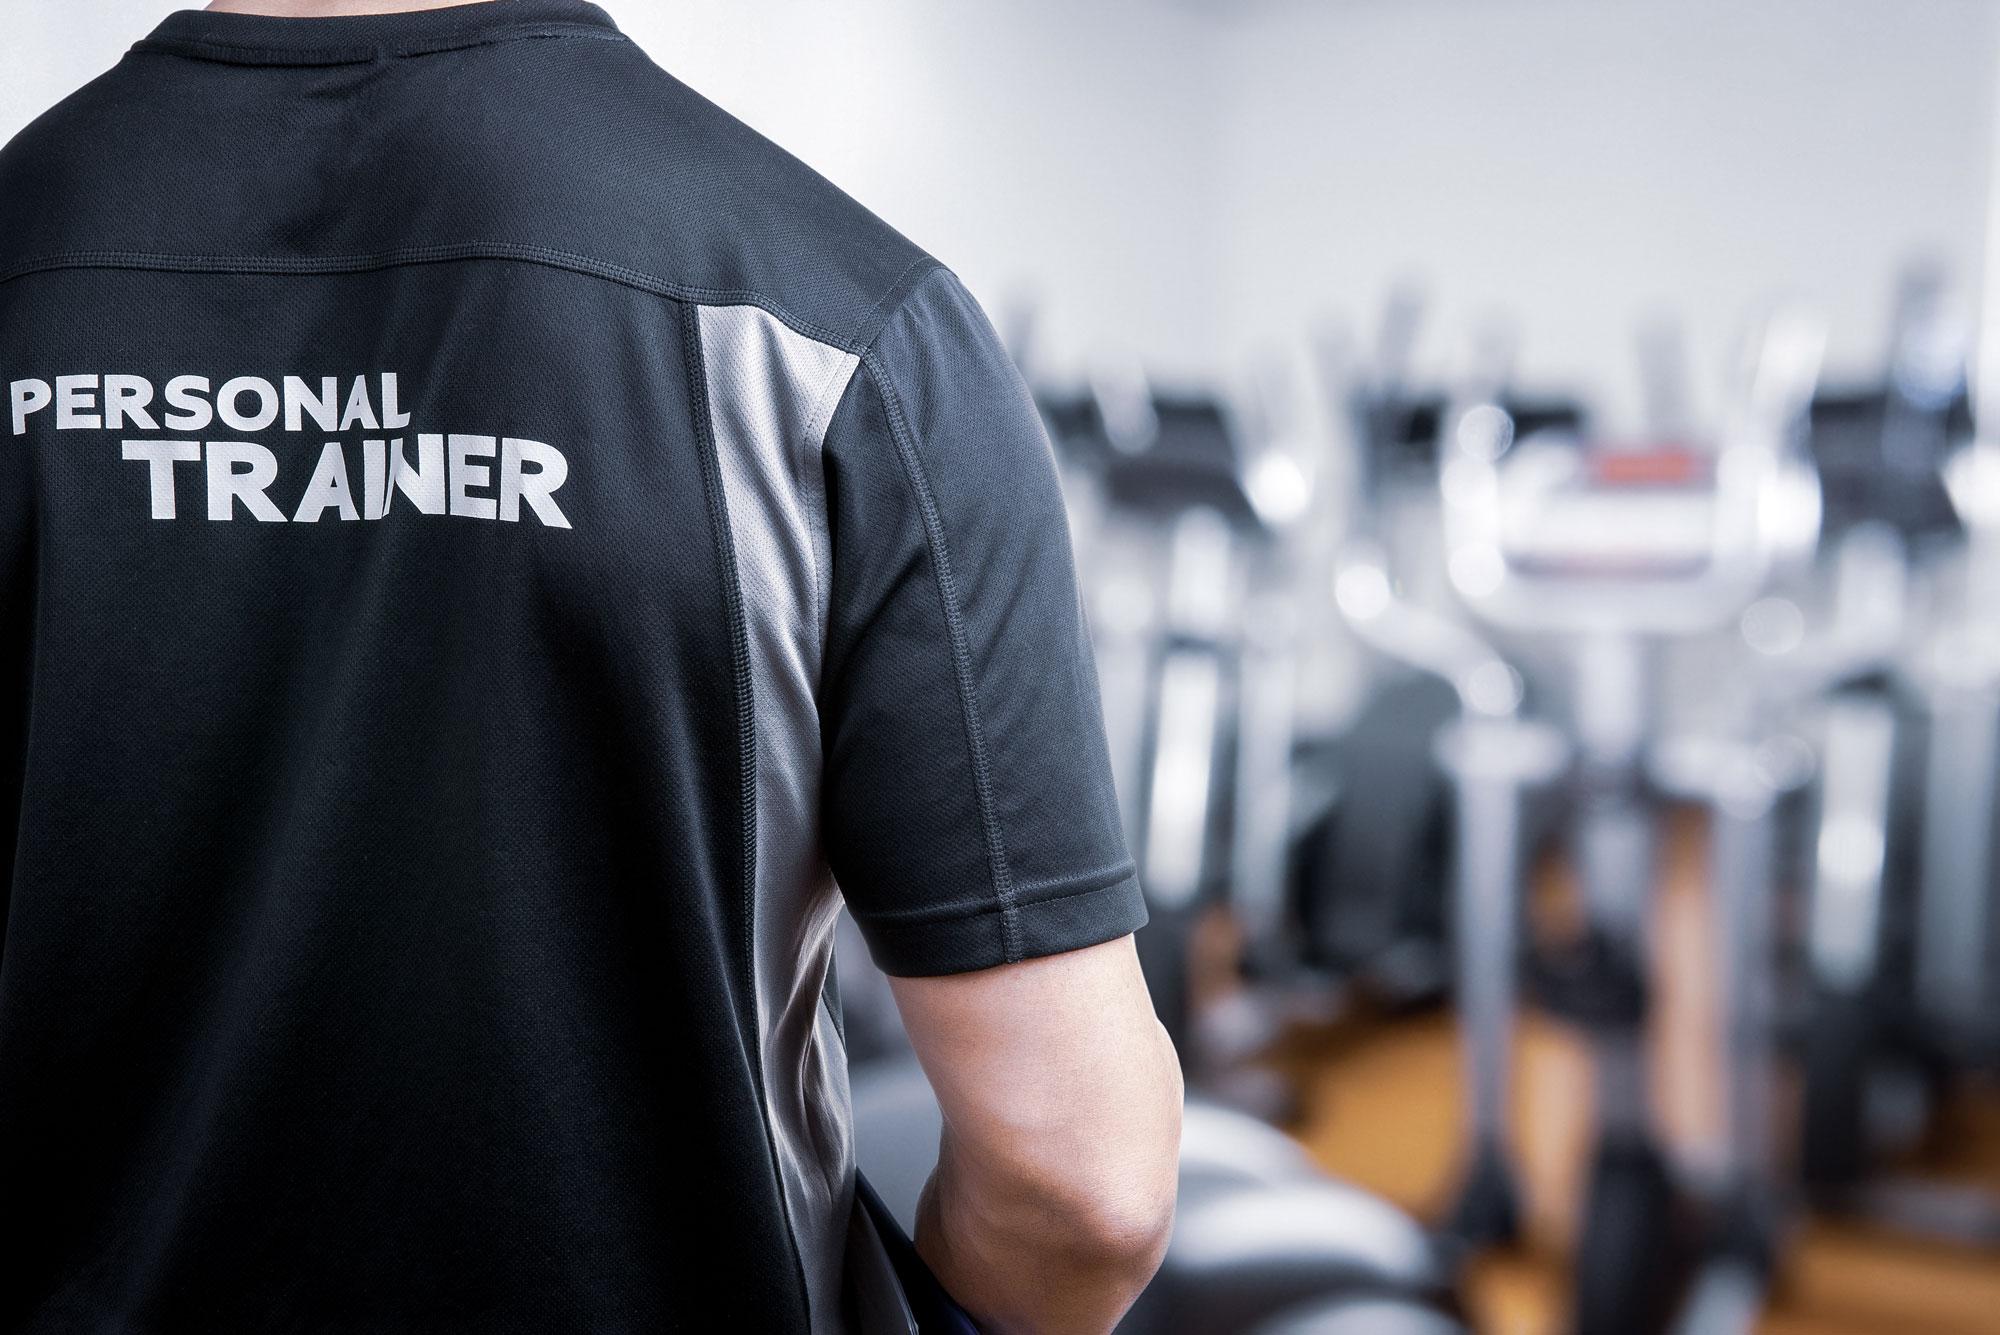 Servizi Extra – Personal Trainer